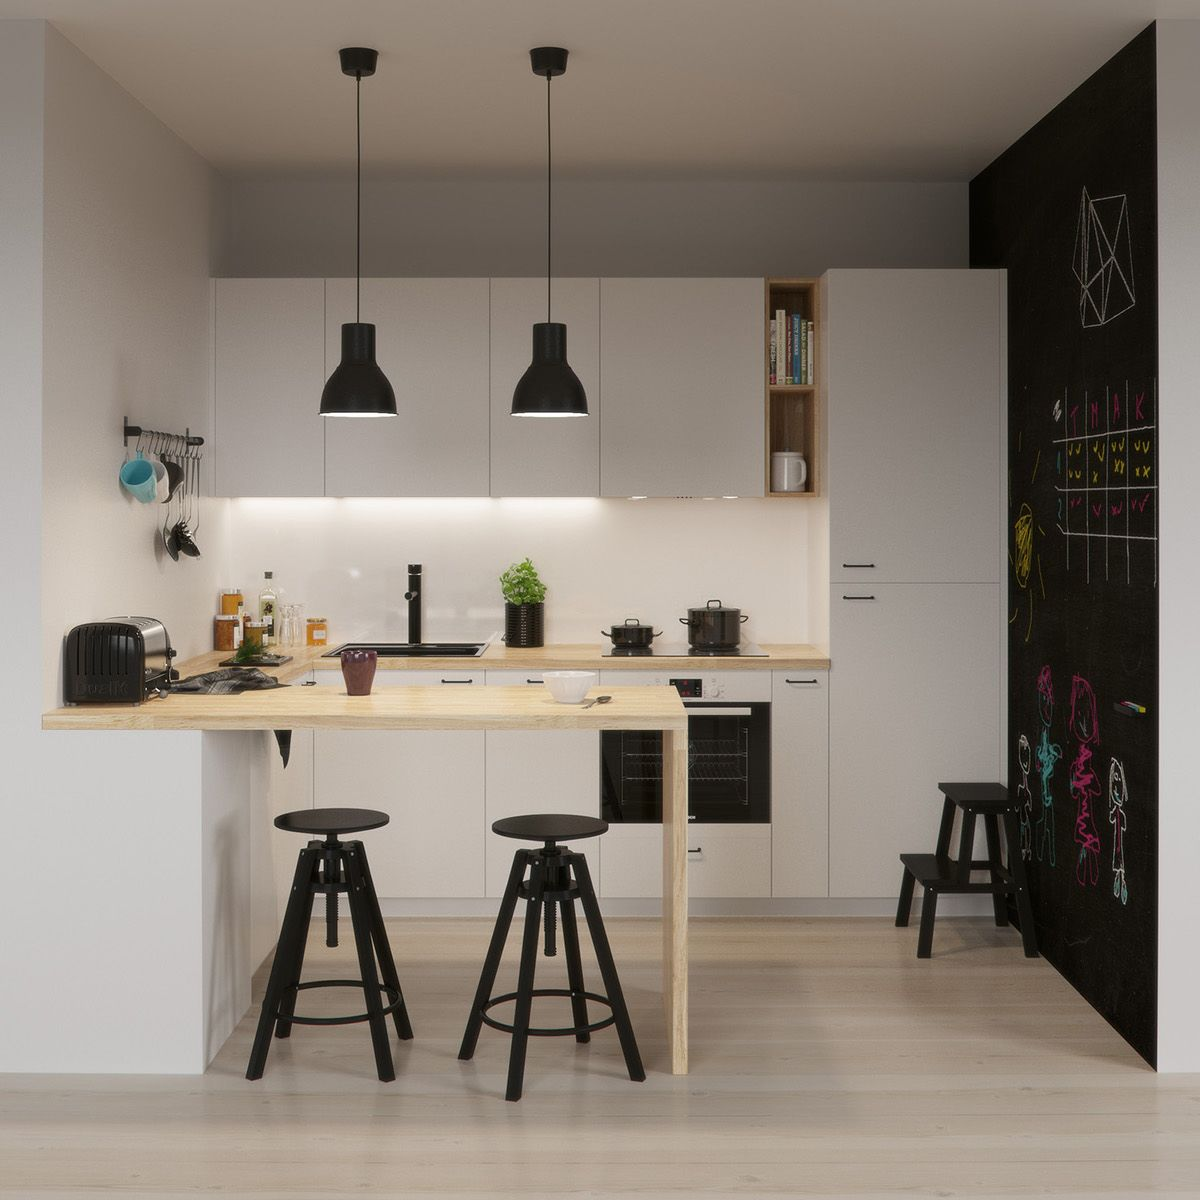 Ikea Kitchen on Behance Renovasi, Desain rumah, Rumah indah